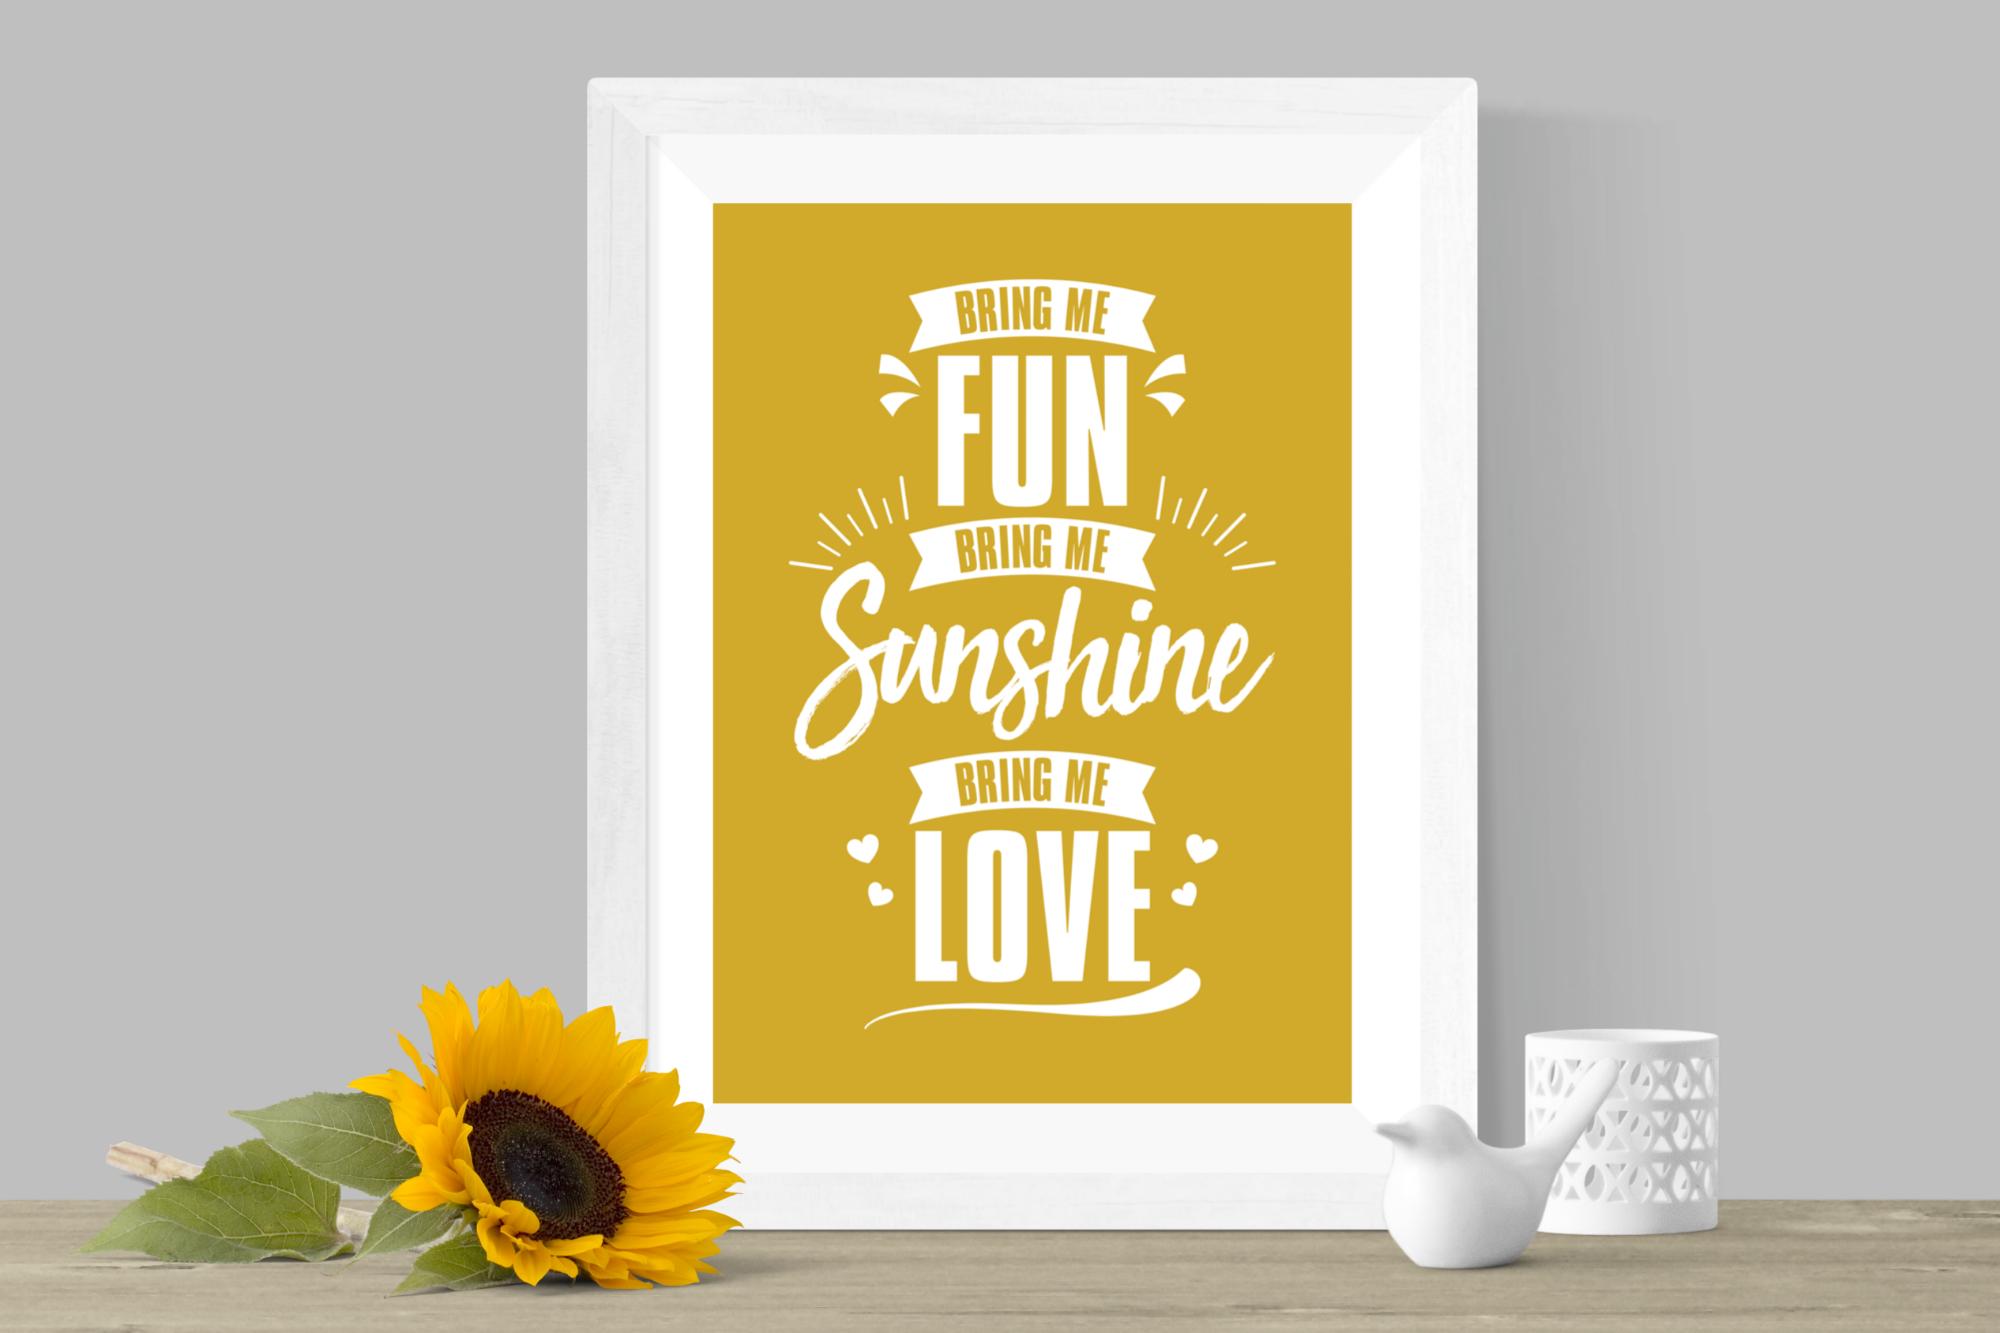 Bring-Me-Sunshine-3-x-2